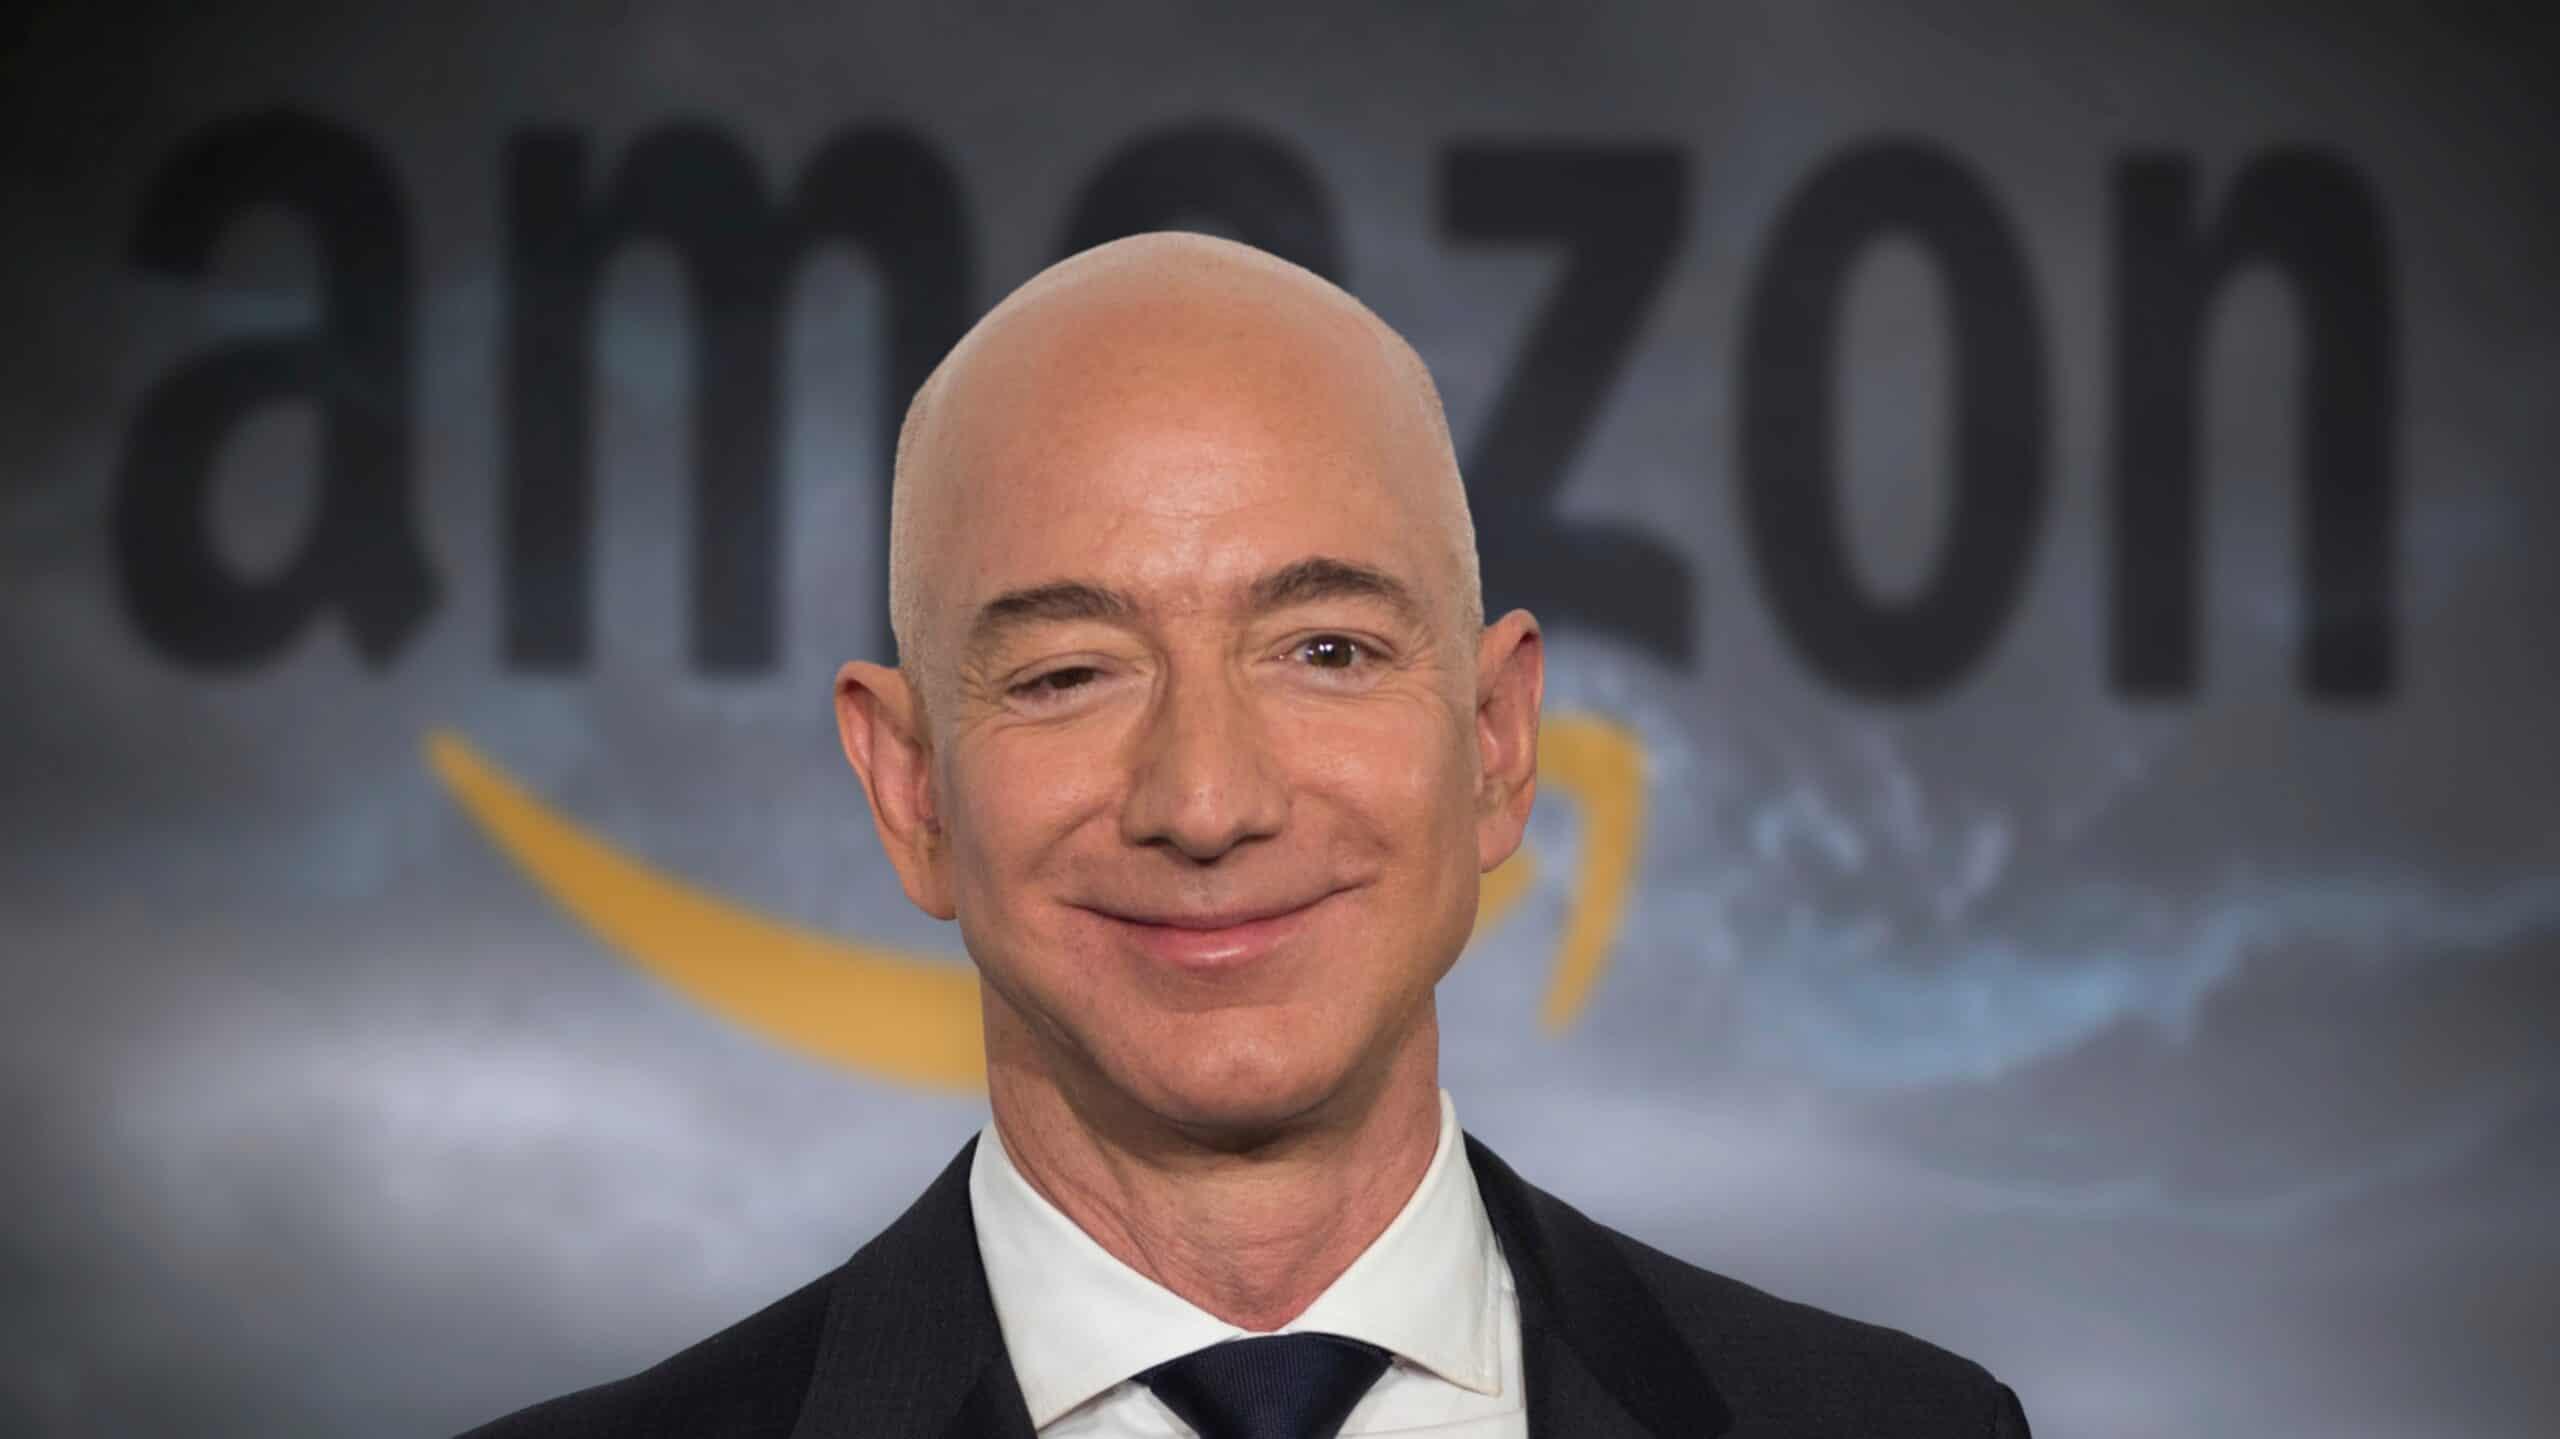 Amazon創業者ジェフ・ベゾス 、自身を時限爆弾に例えられた過去をInstagram回想する。